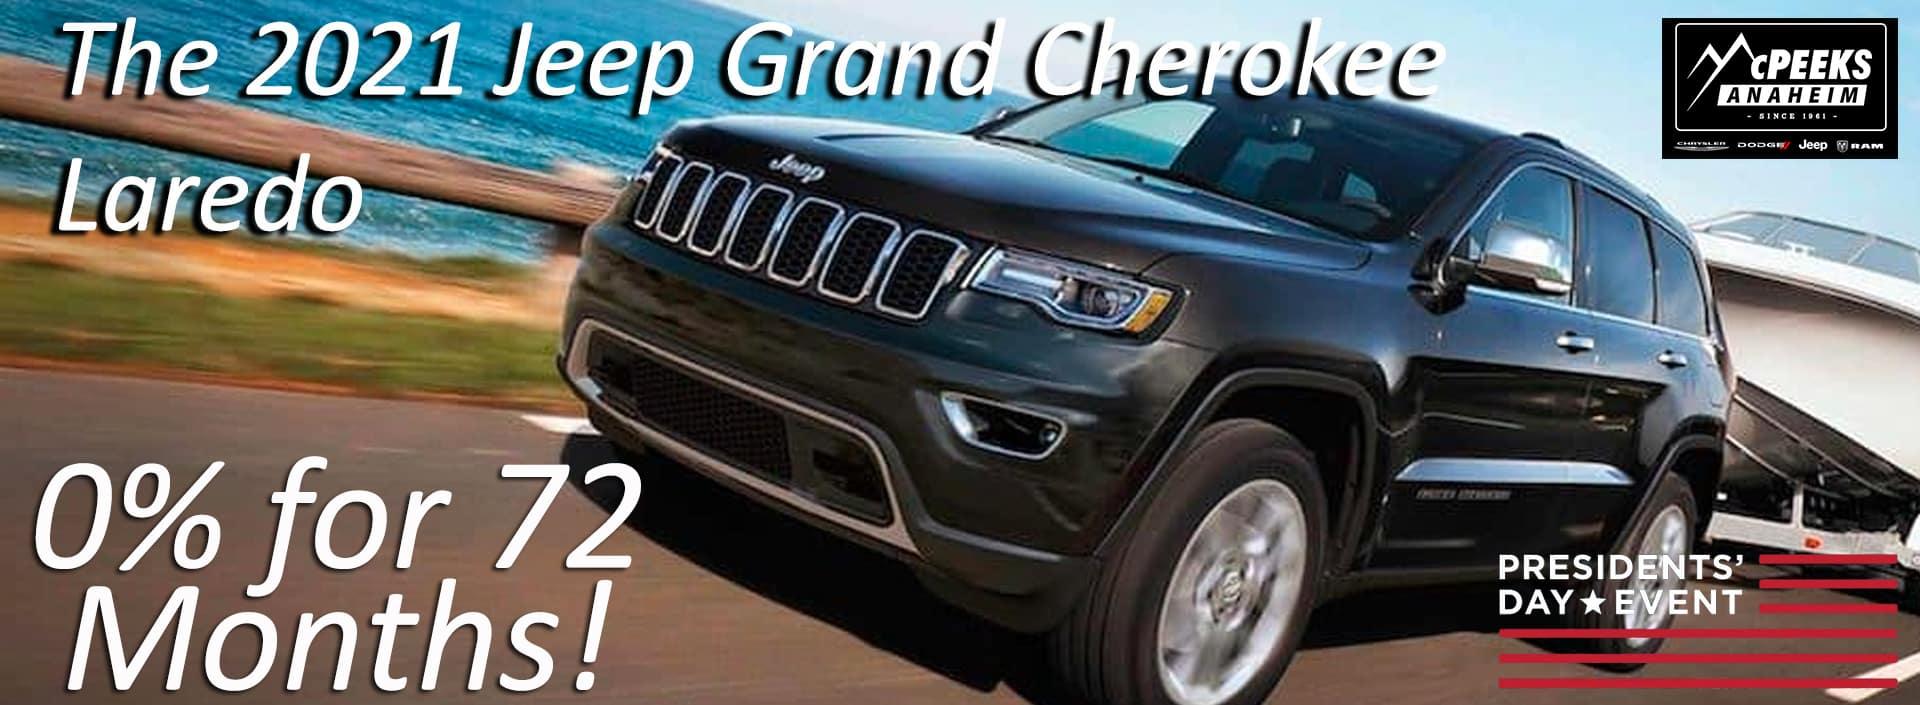 2021_Jeep_Grand_Cherokee_Lareado_Banner